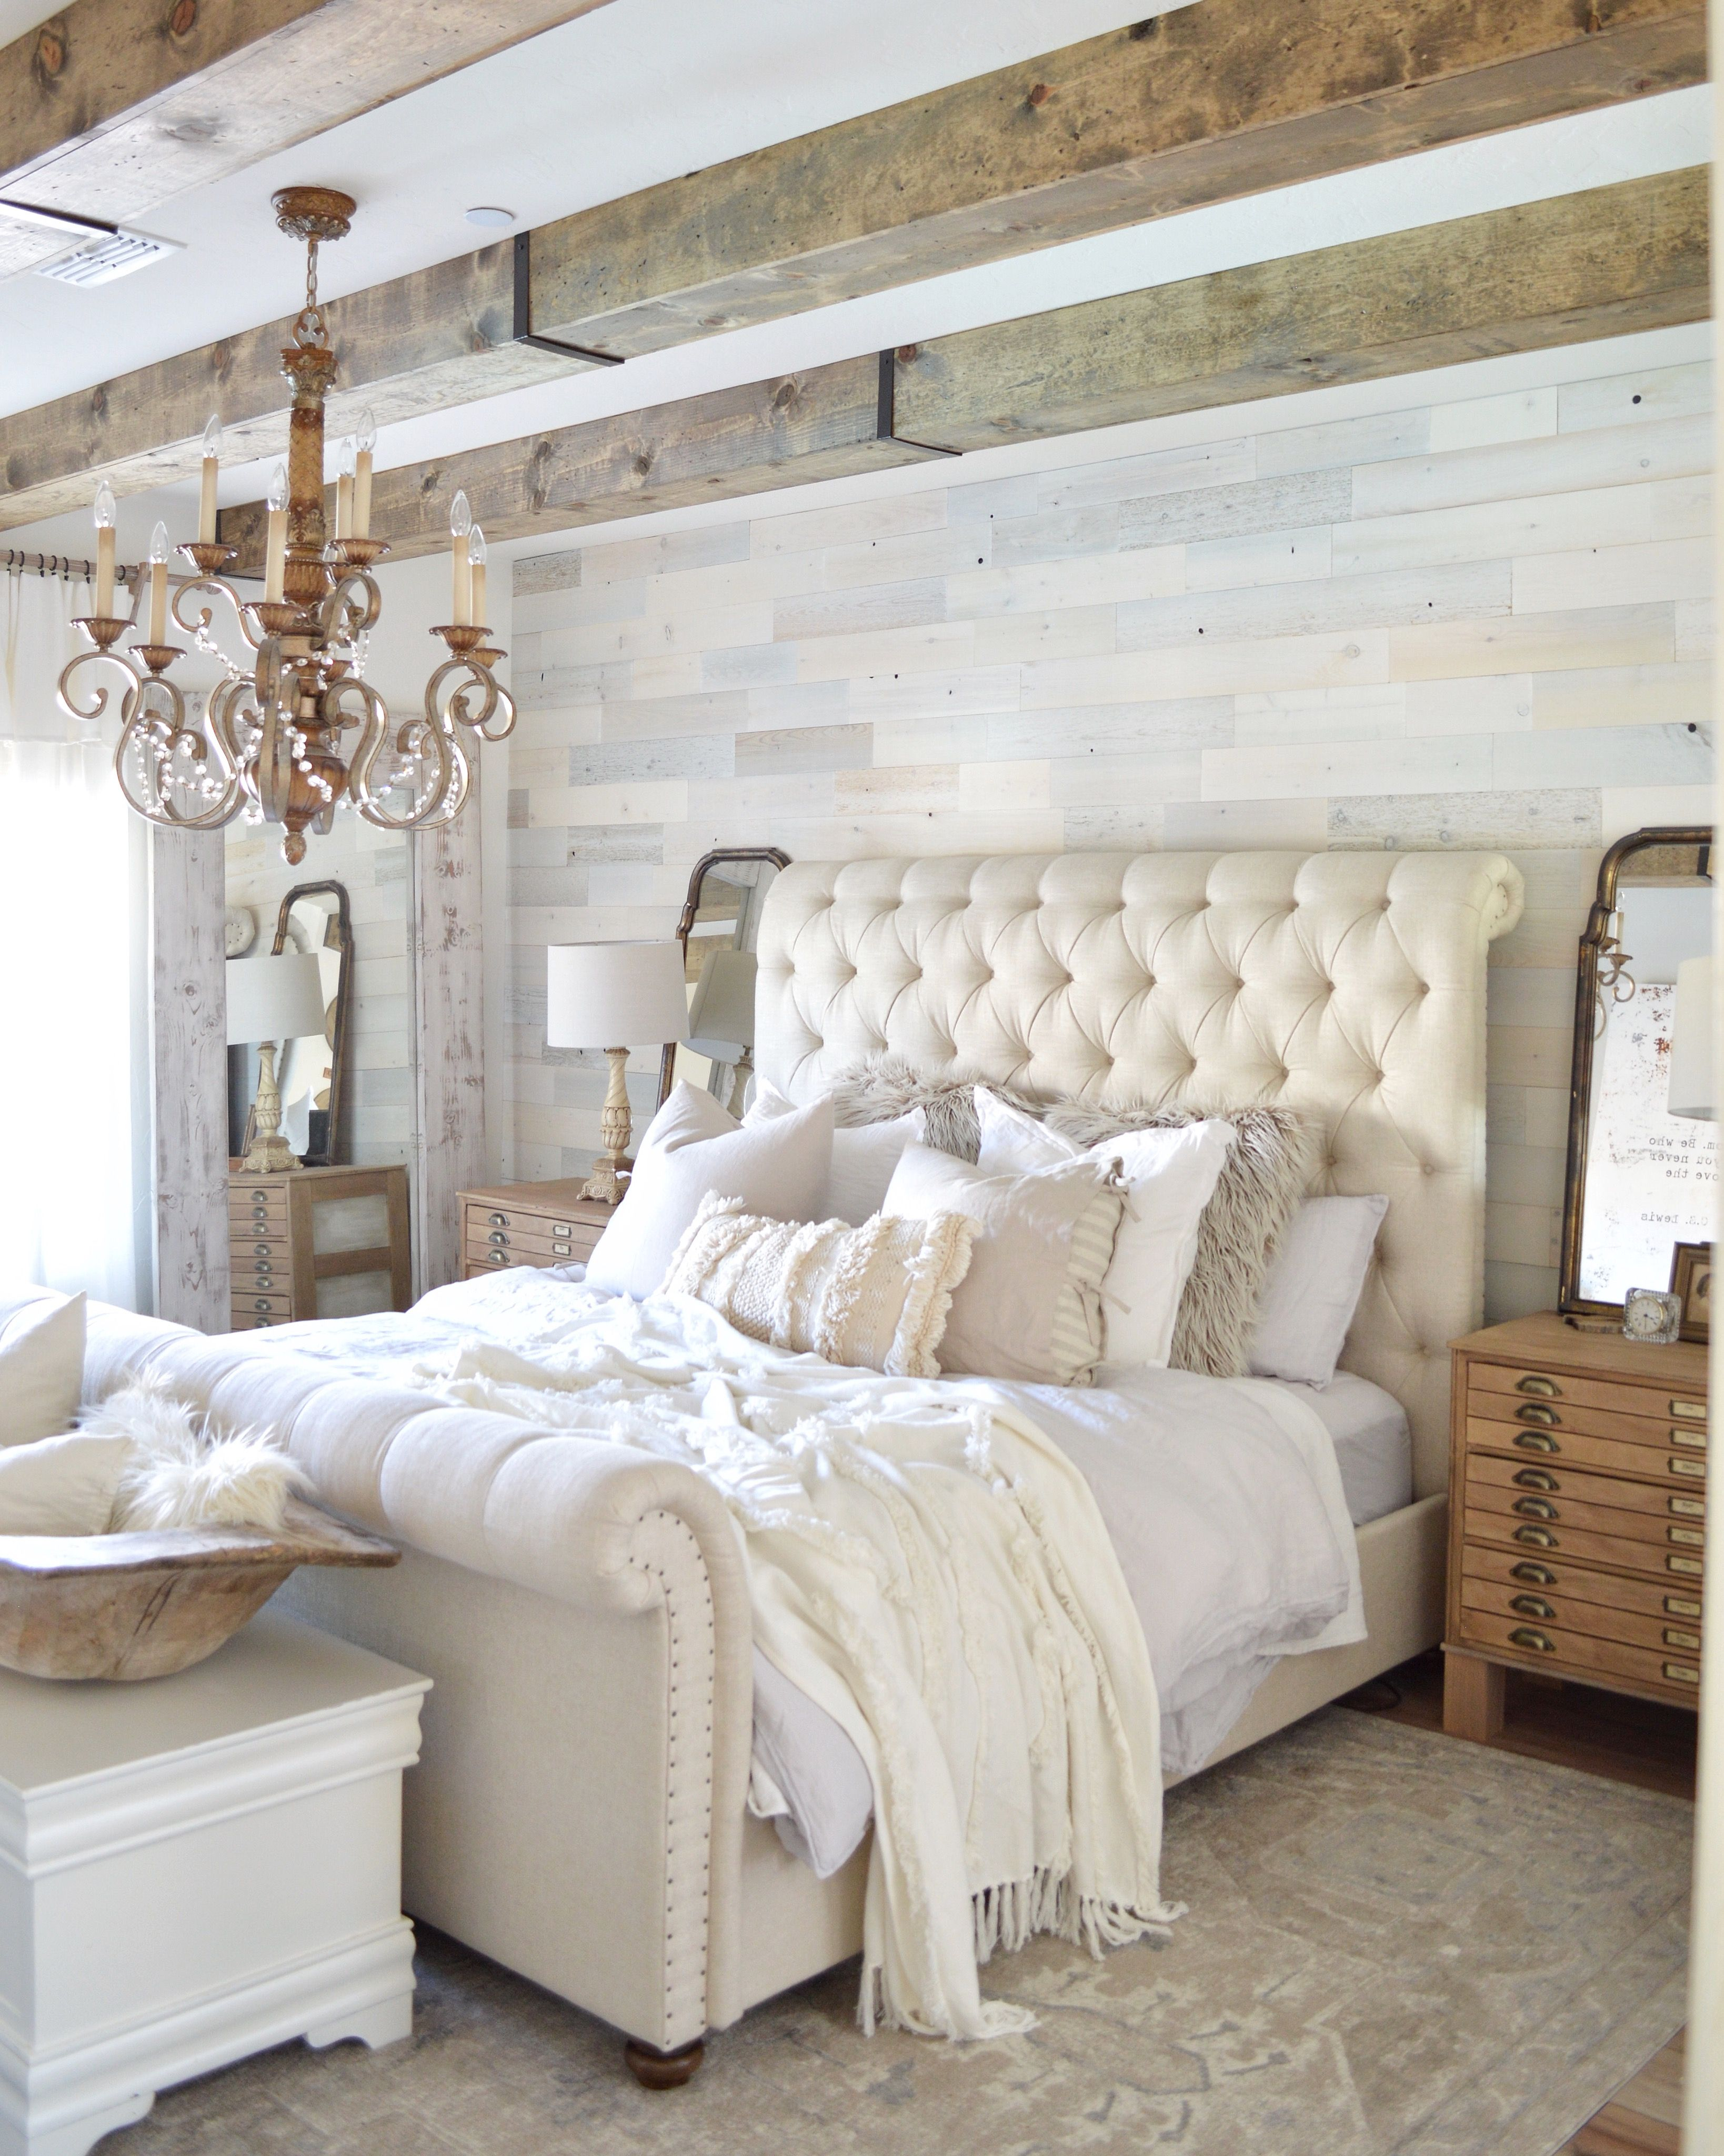 Ashleyfurniture Com Bedroom Sets: DIY Faux Wood Beams